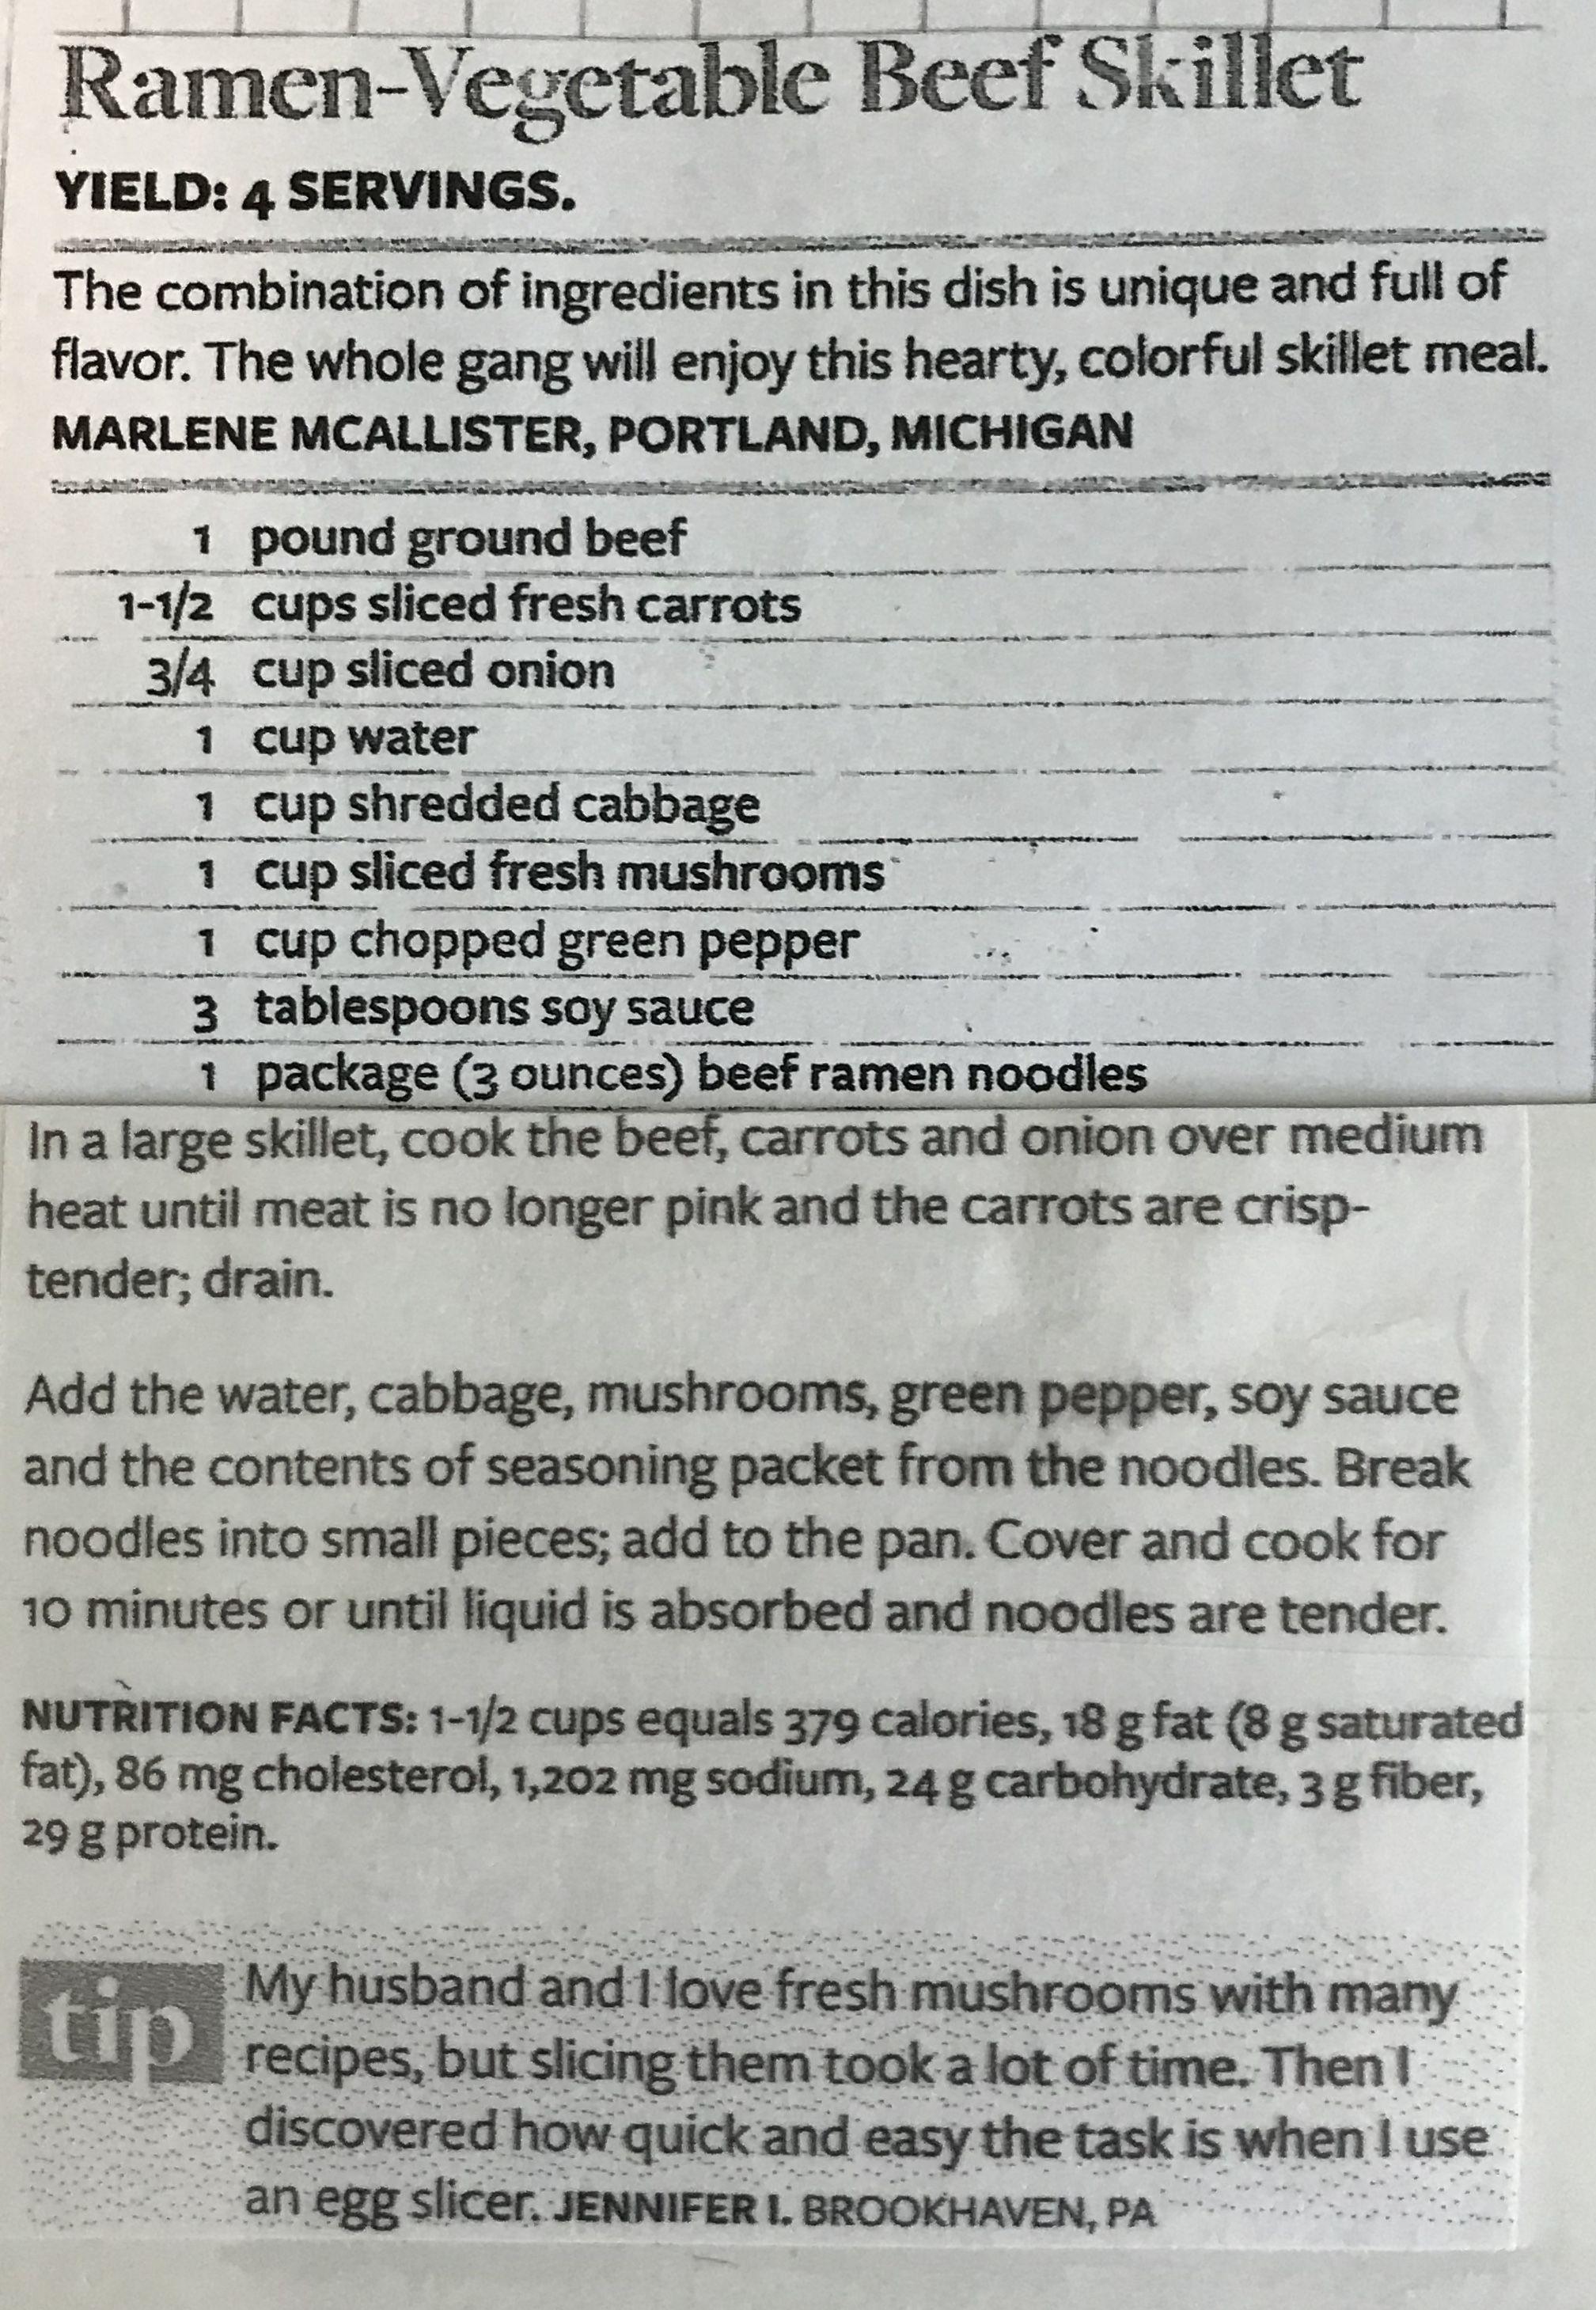 Ramen Vegetable Beef Skillet Ramen Noodle Recipes Beef Recipes Beef